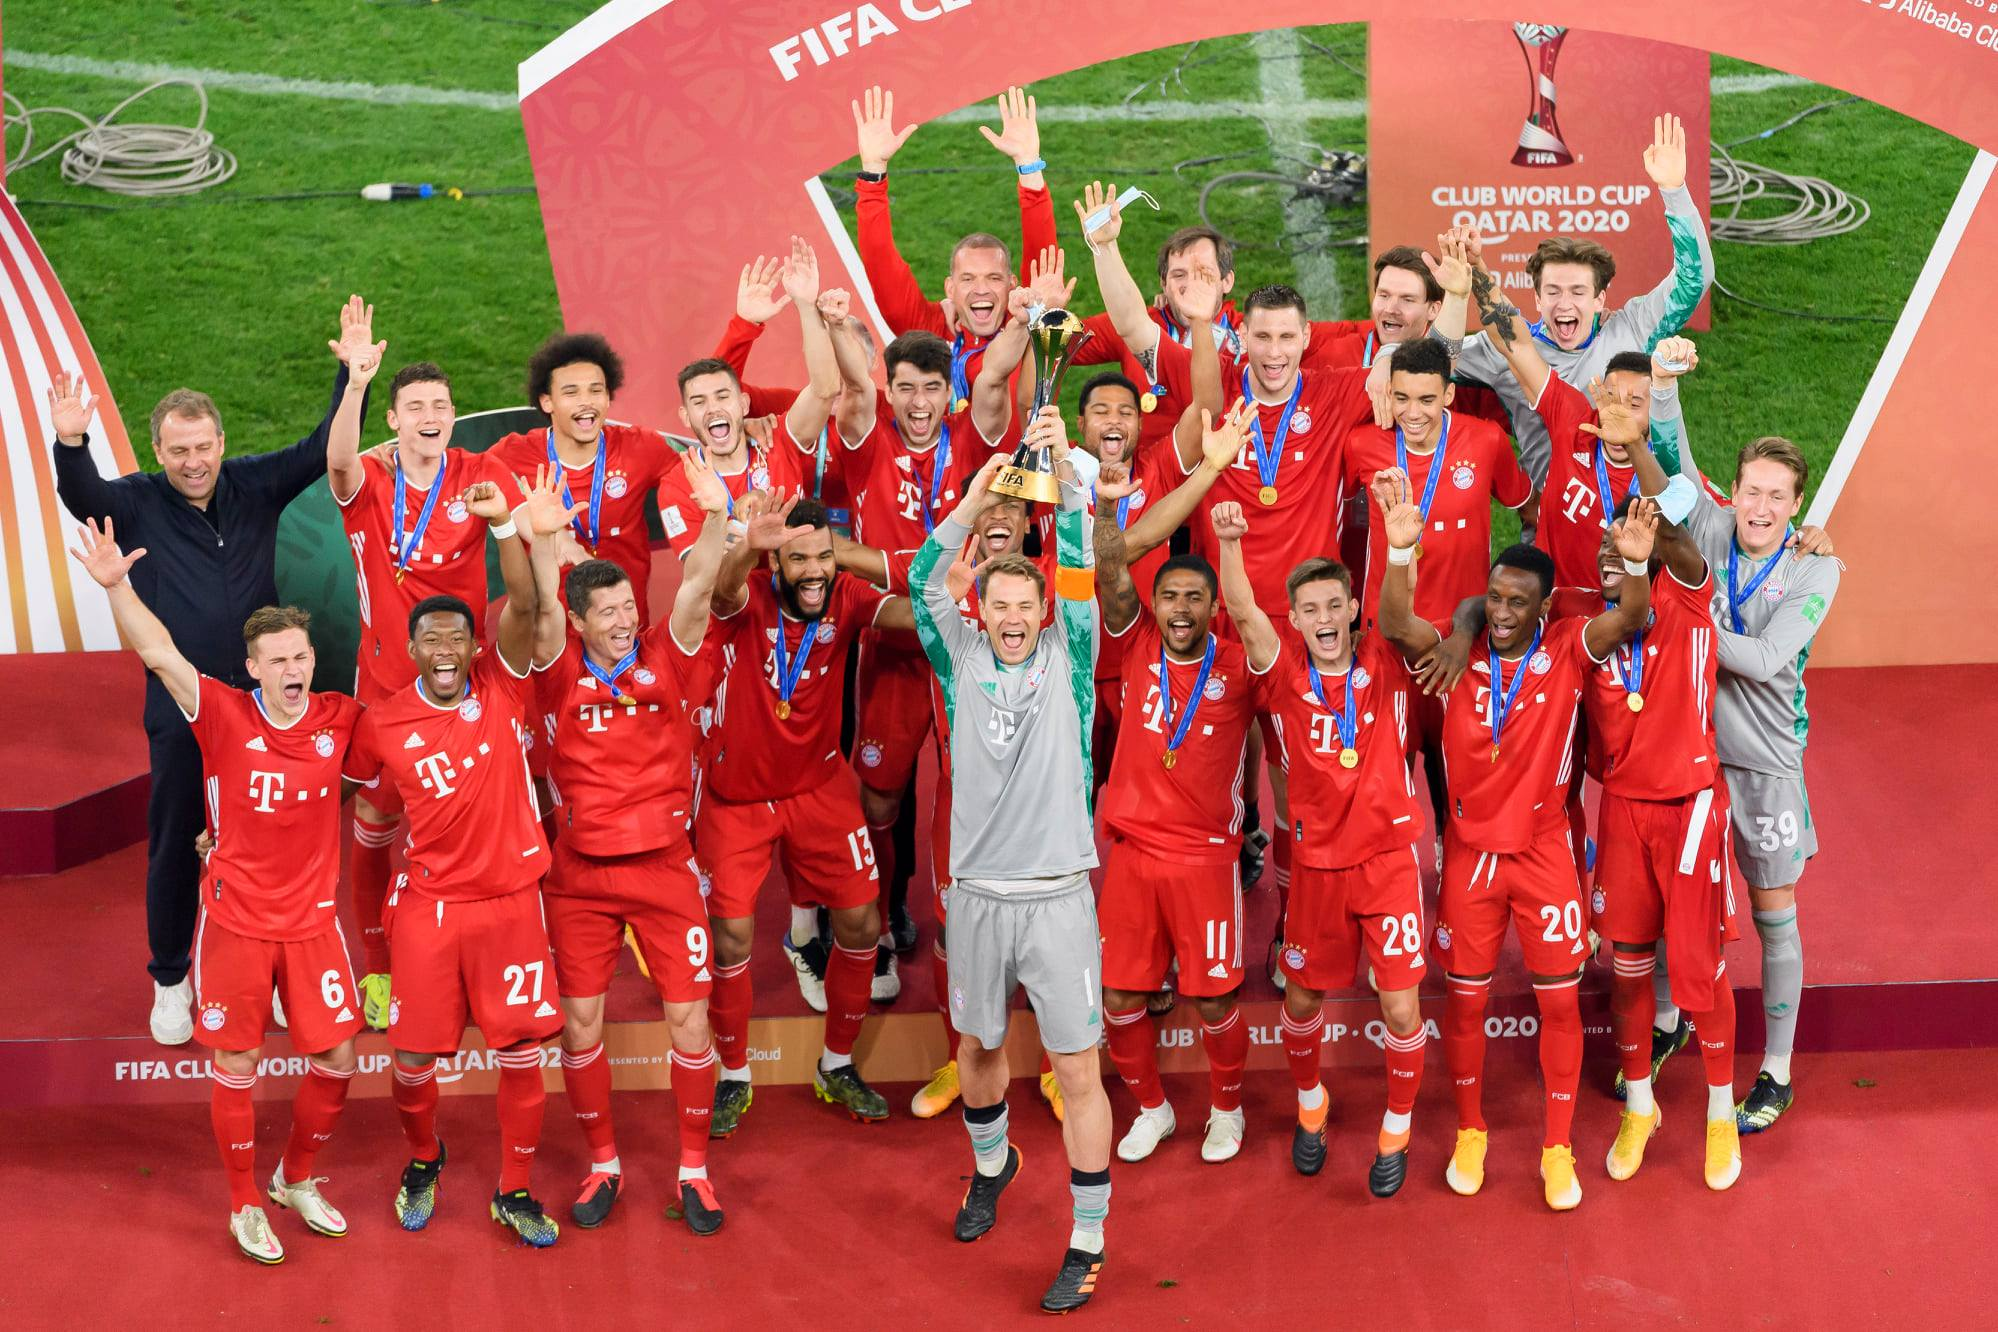 Bayern München verdensmestre